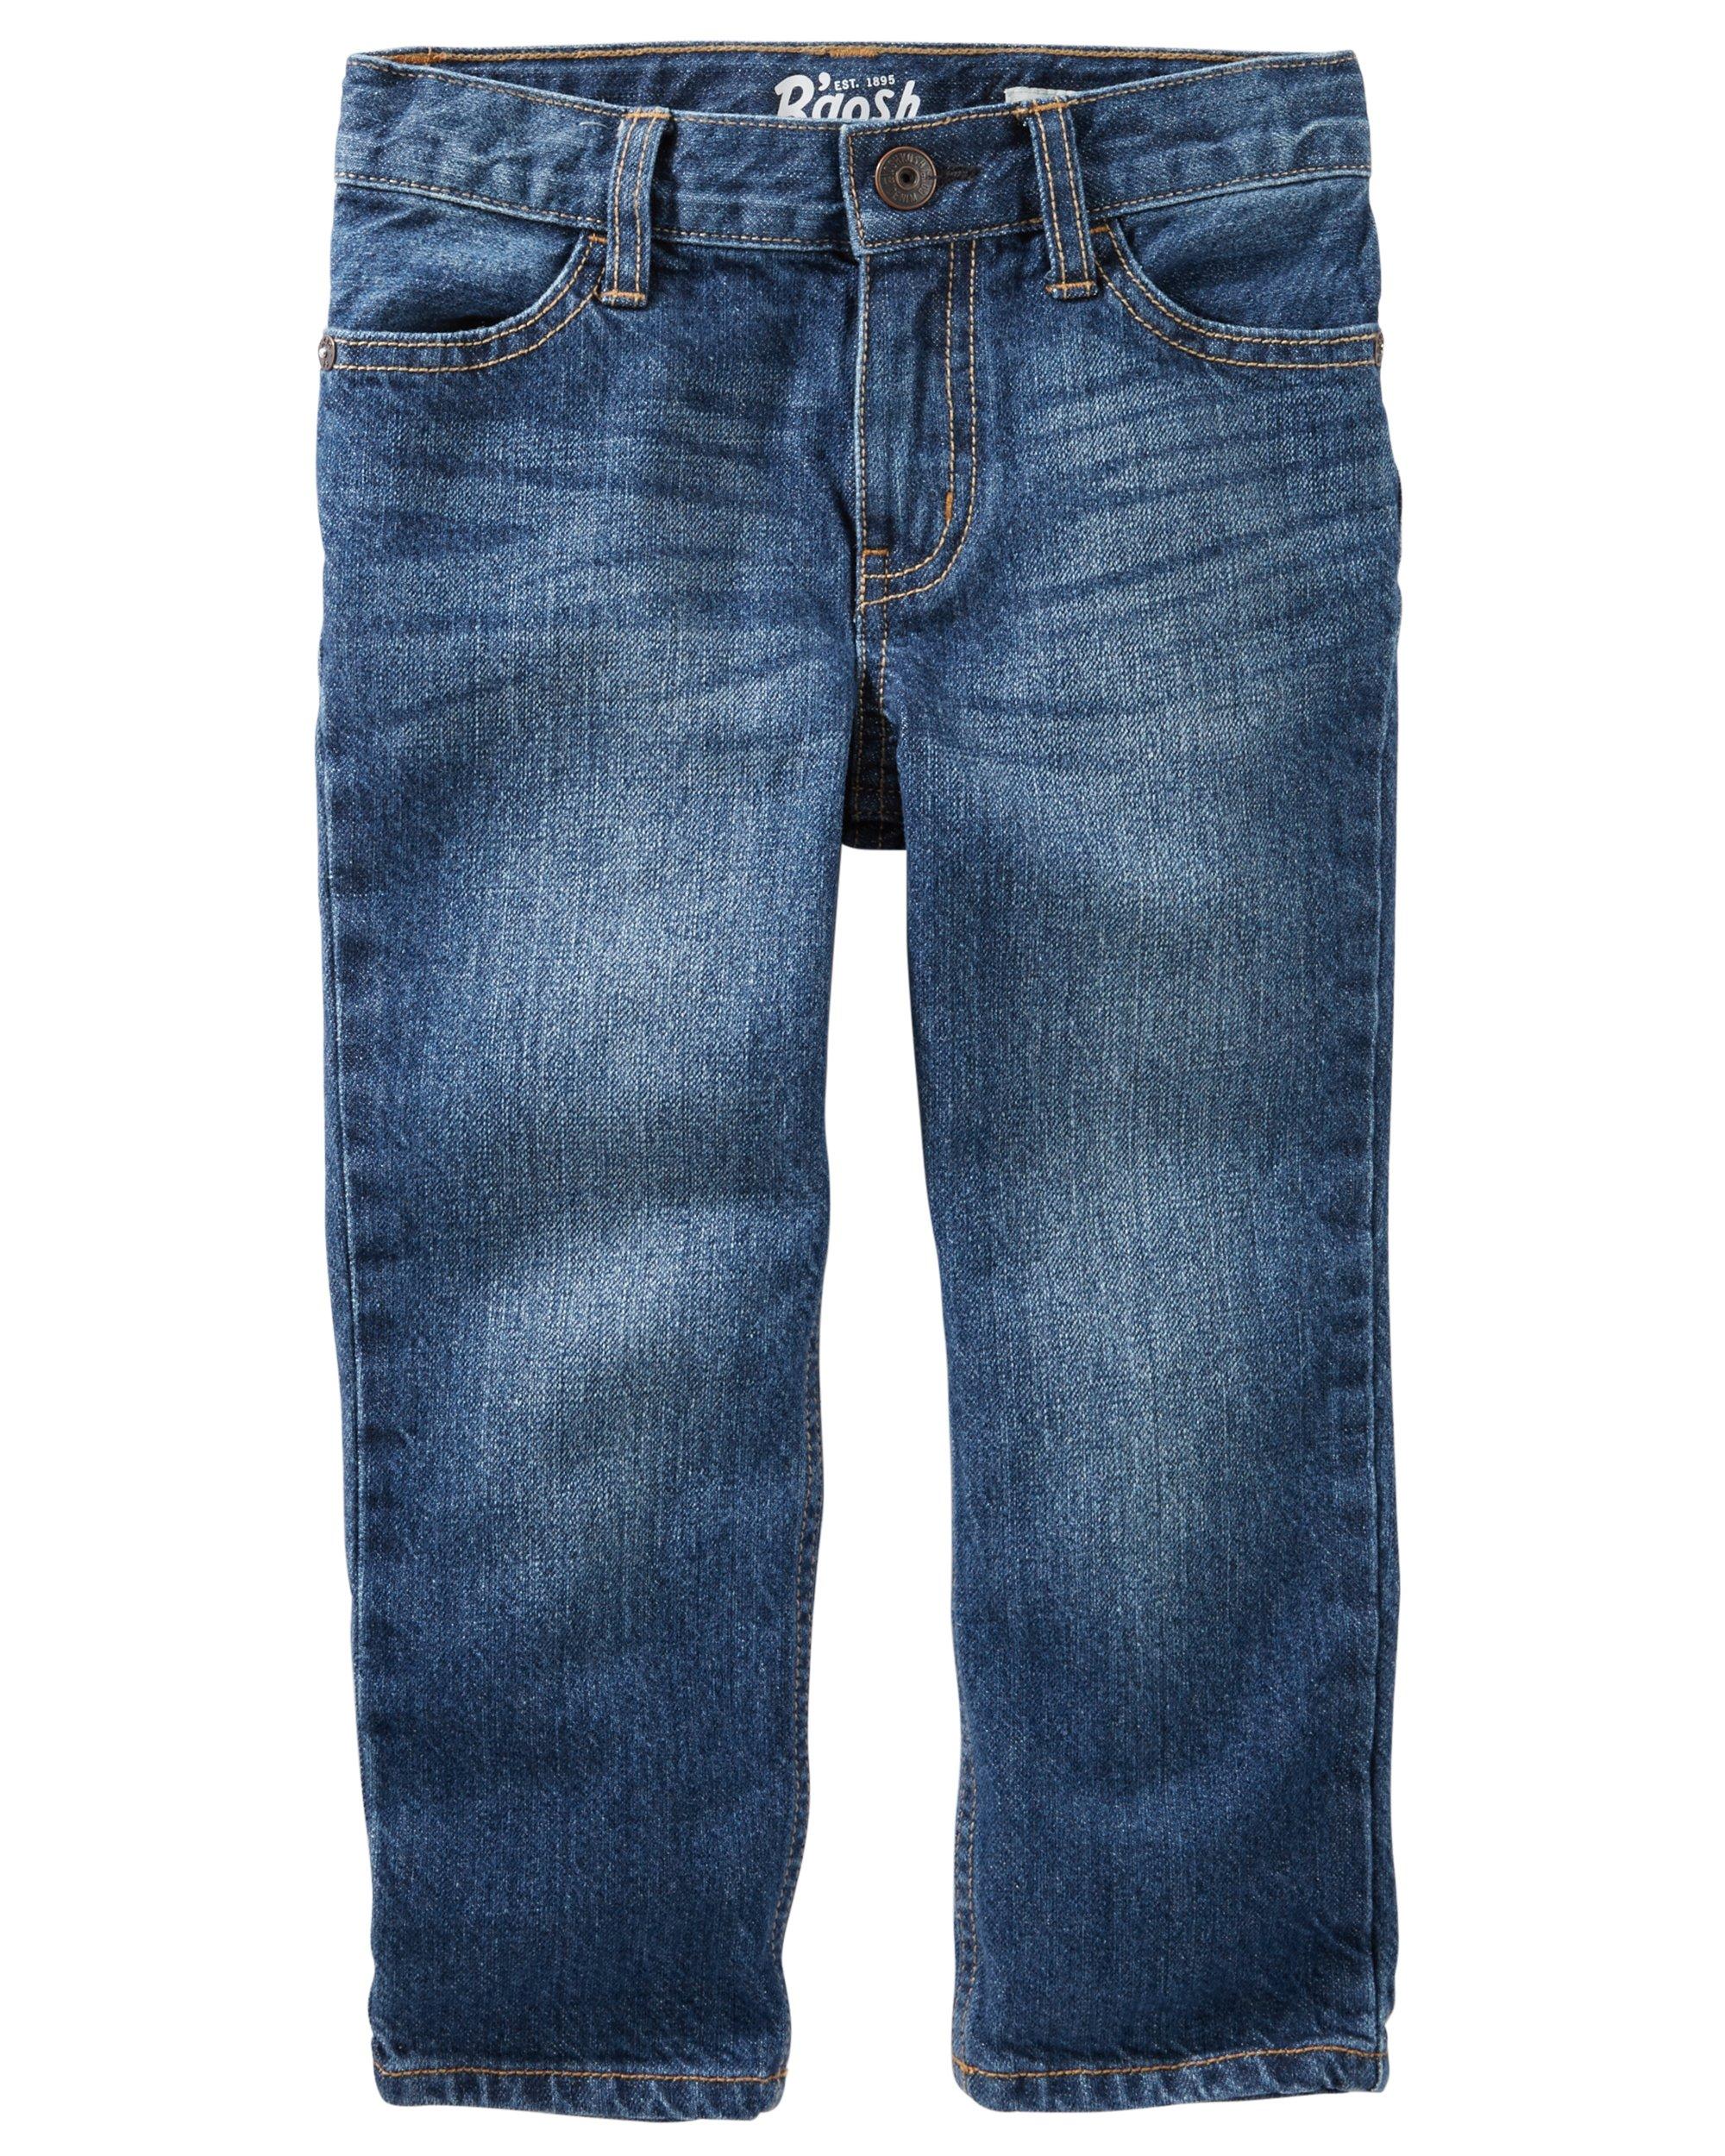 Osh Kosh Boys' Straight Jeans, Anchor Dark, 4T